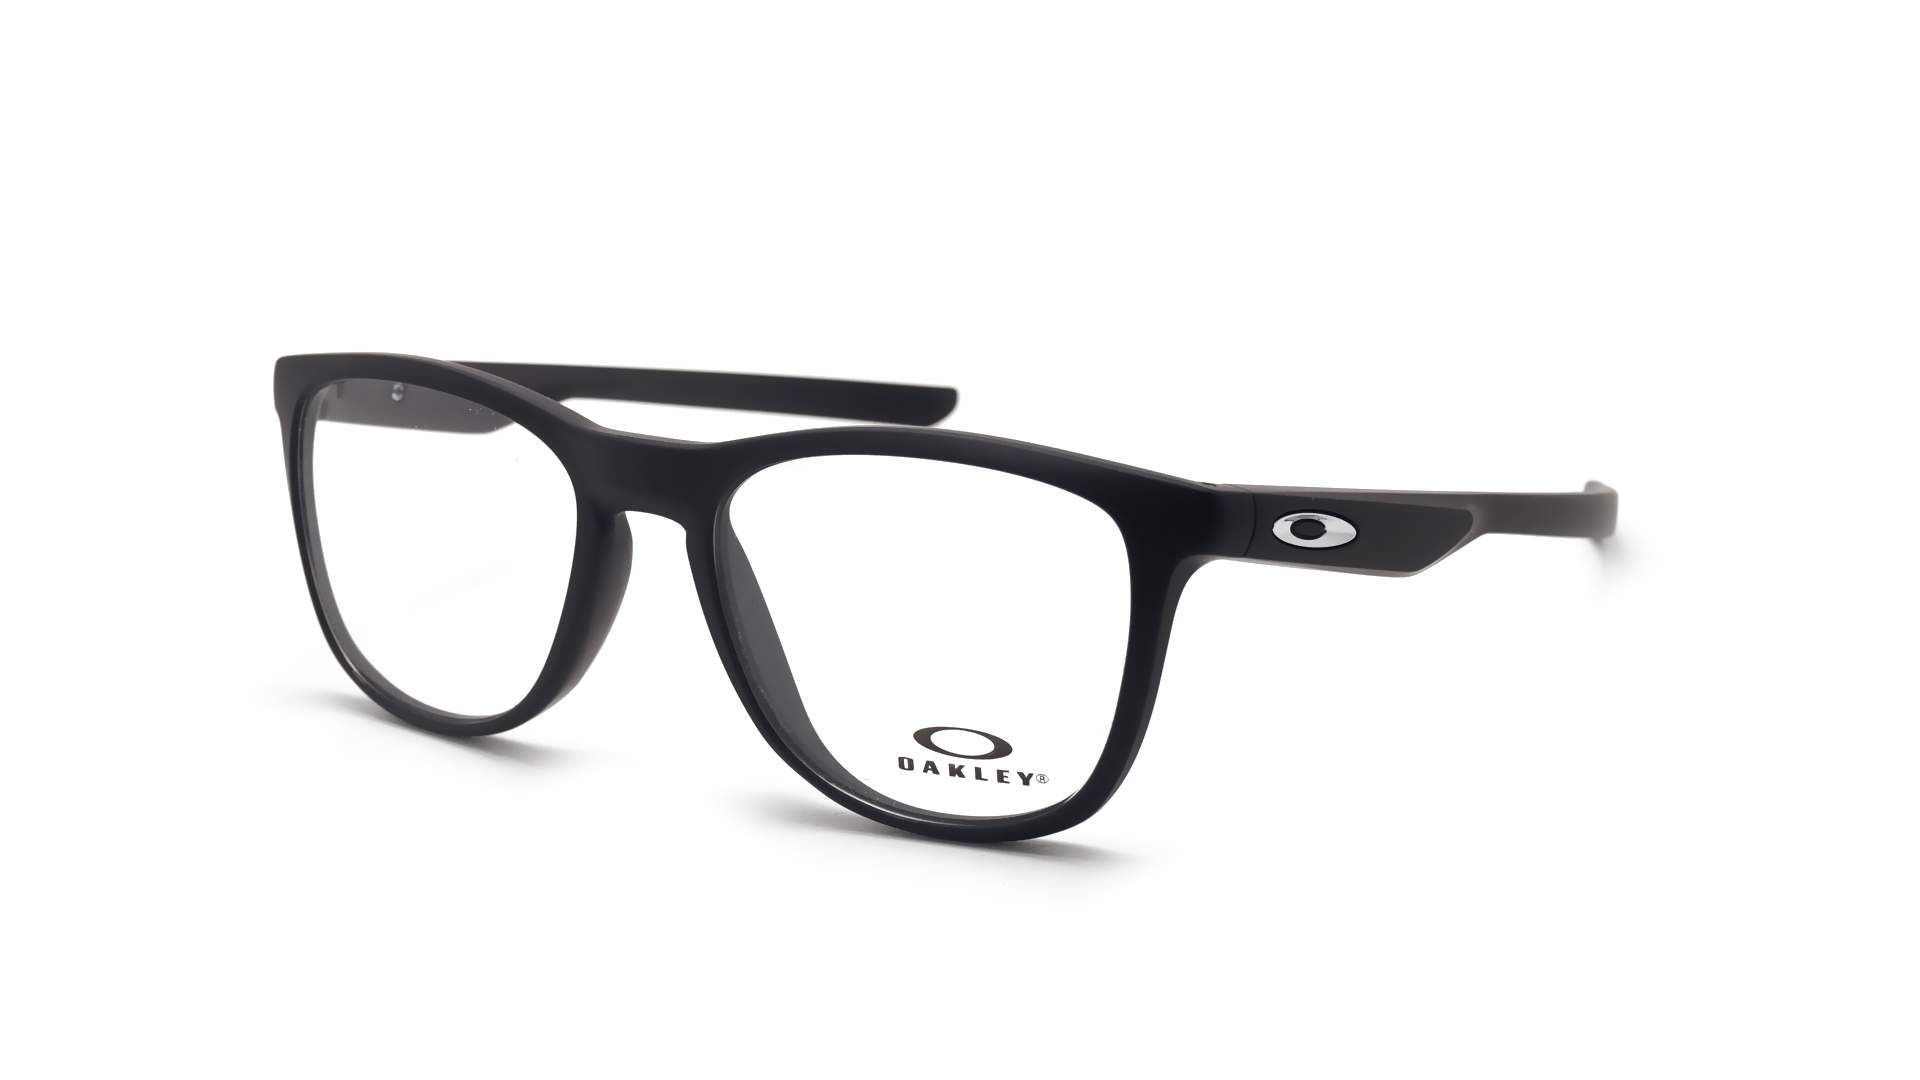 bb1c560fd4 Eyeglasses Oakley Trillbe x Black Matte OX8130 01 52-18 Medium